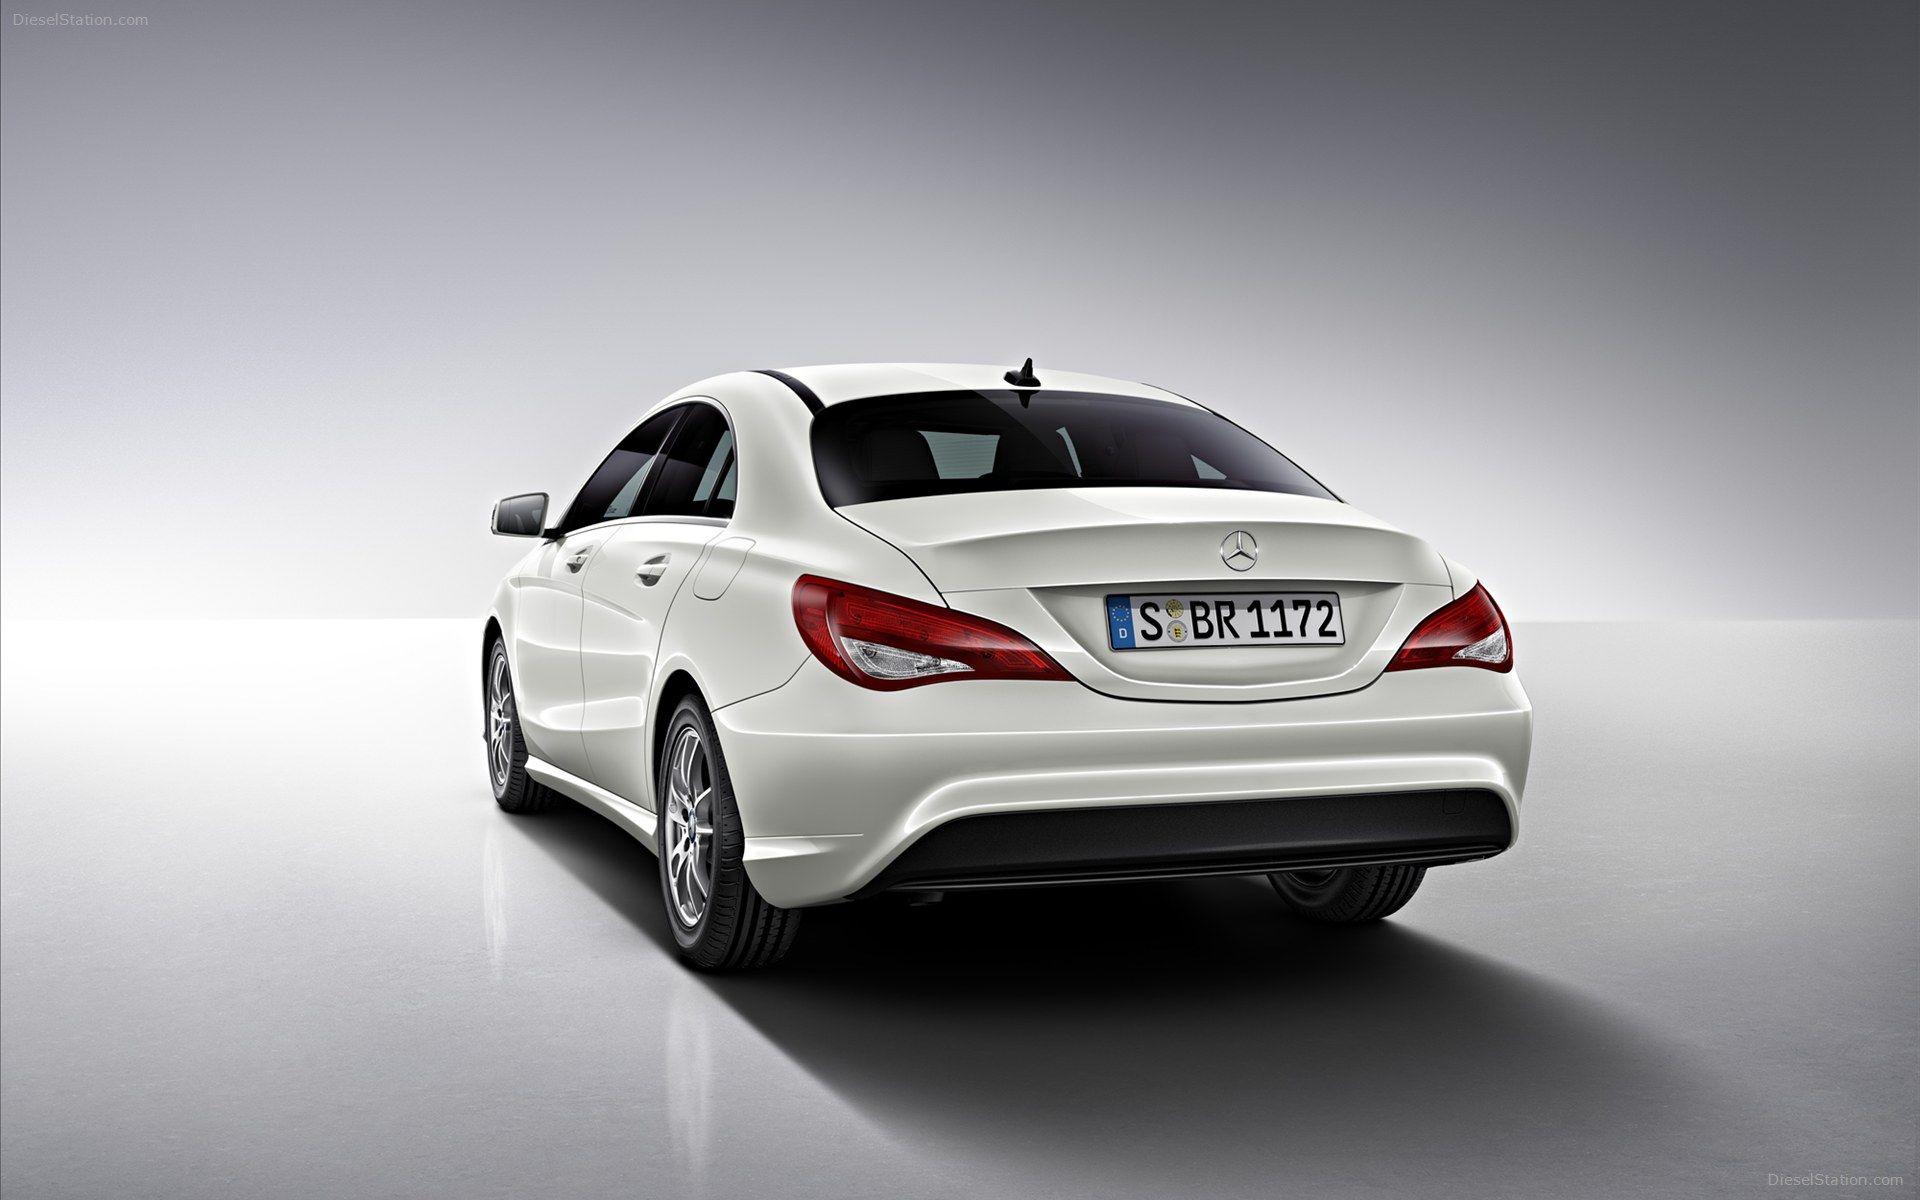 Mercedes Benz CLA250 Edition 1 2014 Dream Cars